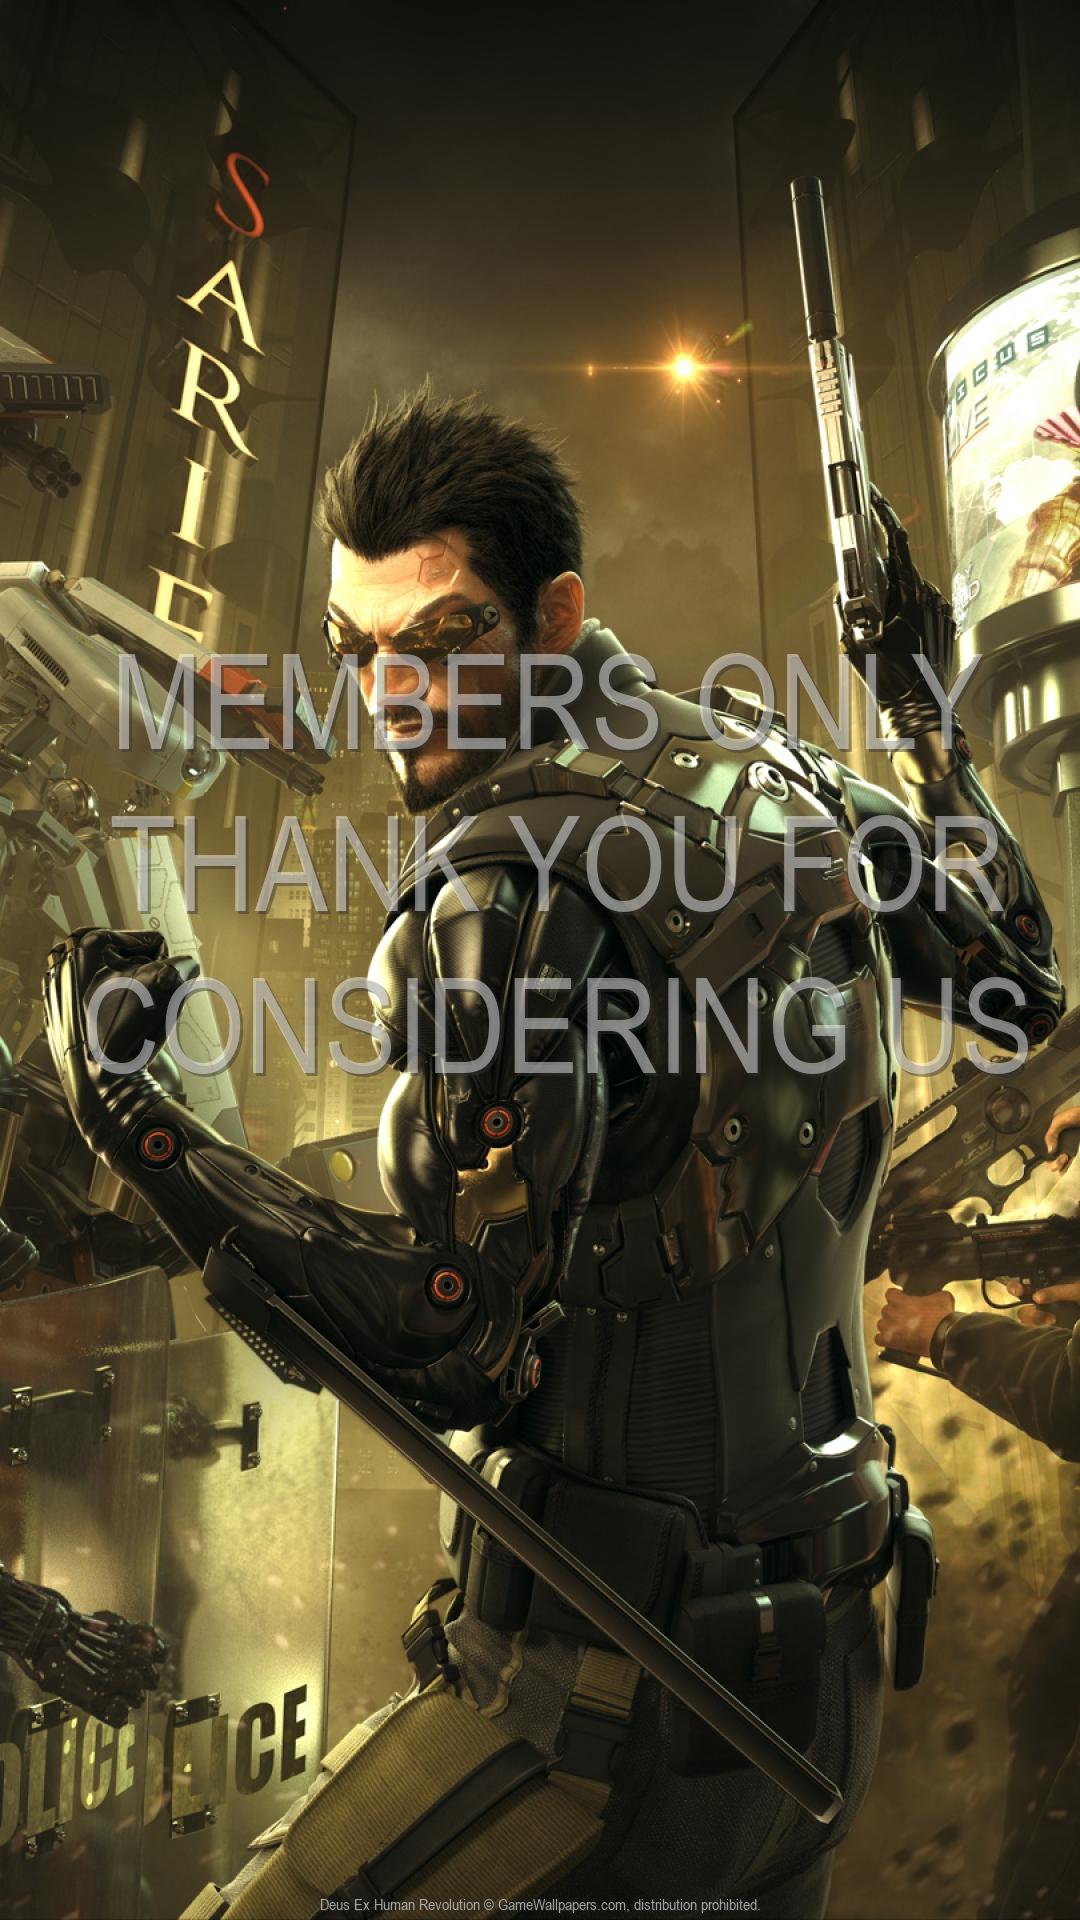 Deus Ex: Human Revolution 1920x1080 Handy Hintergrundbild 19